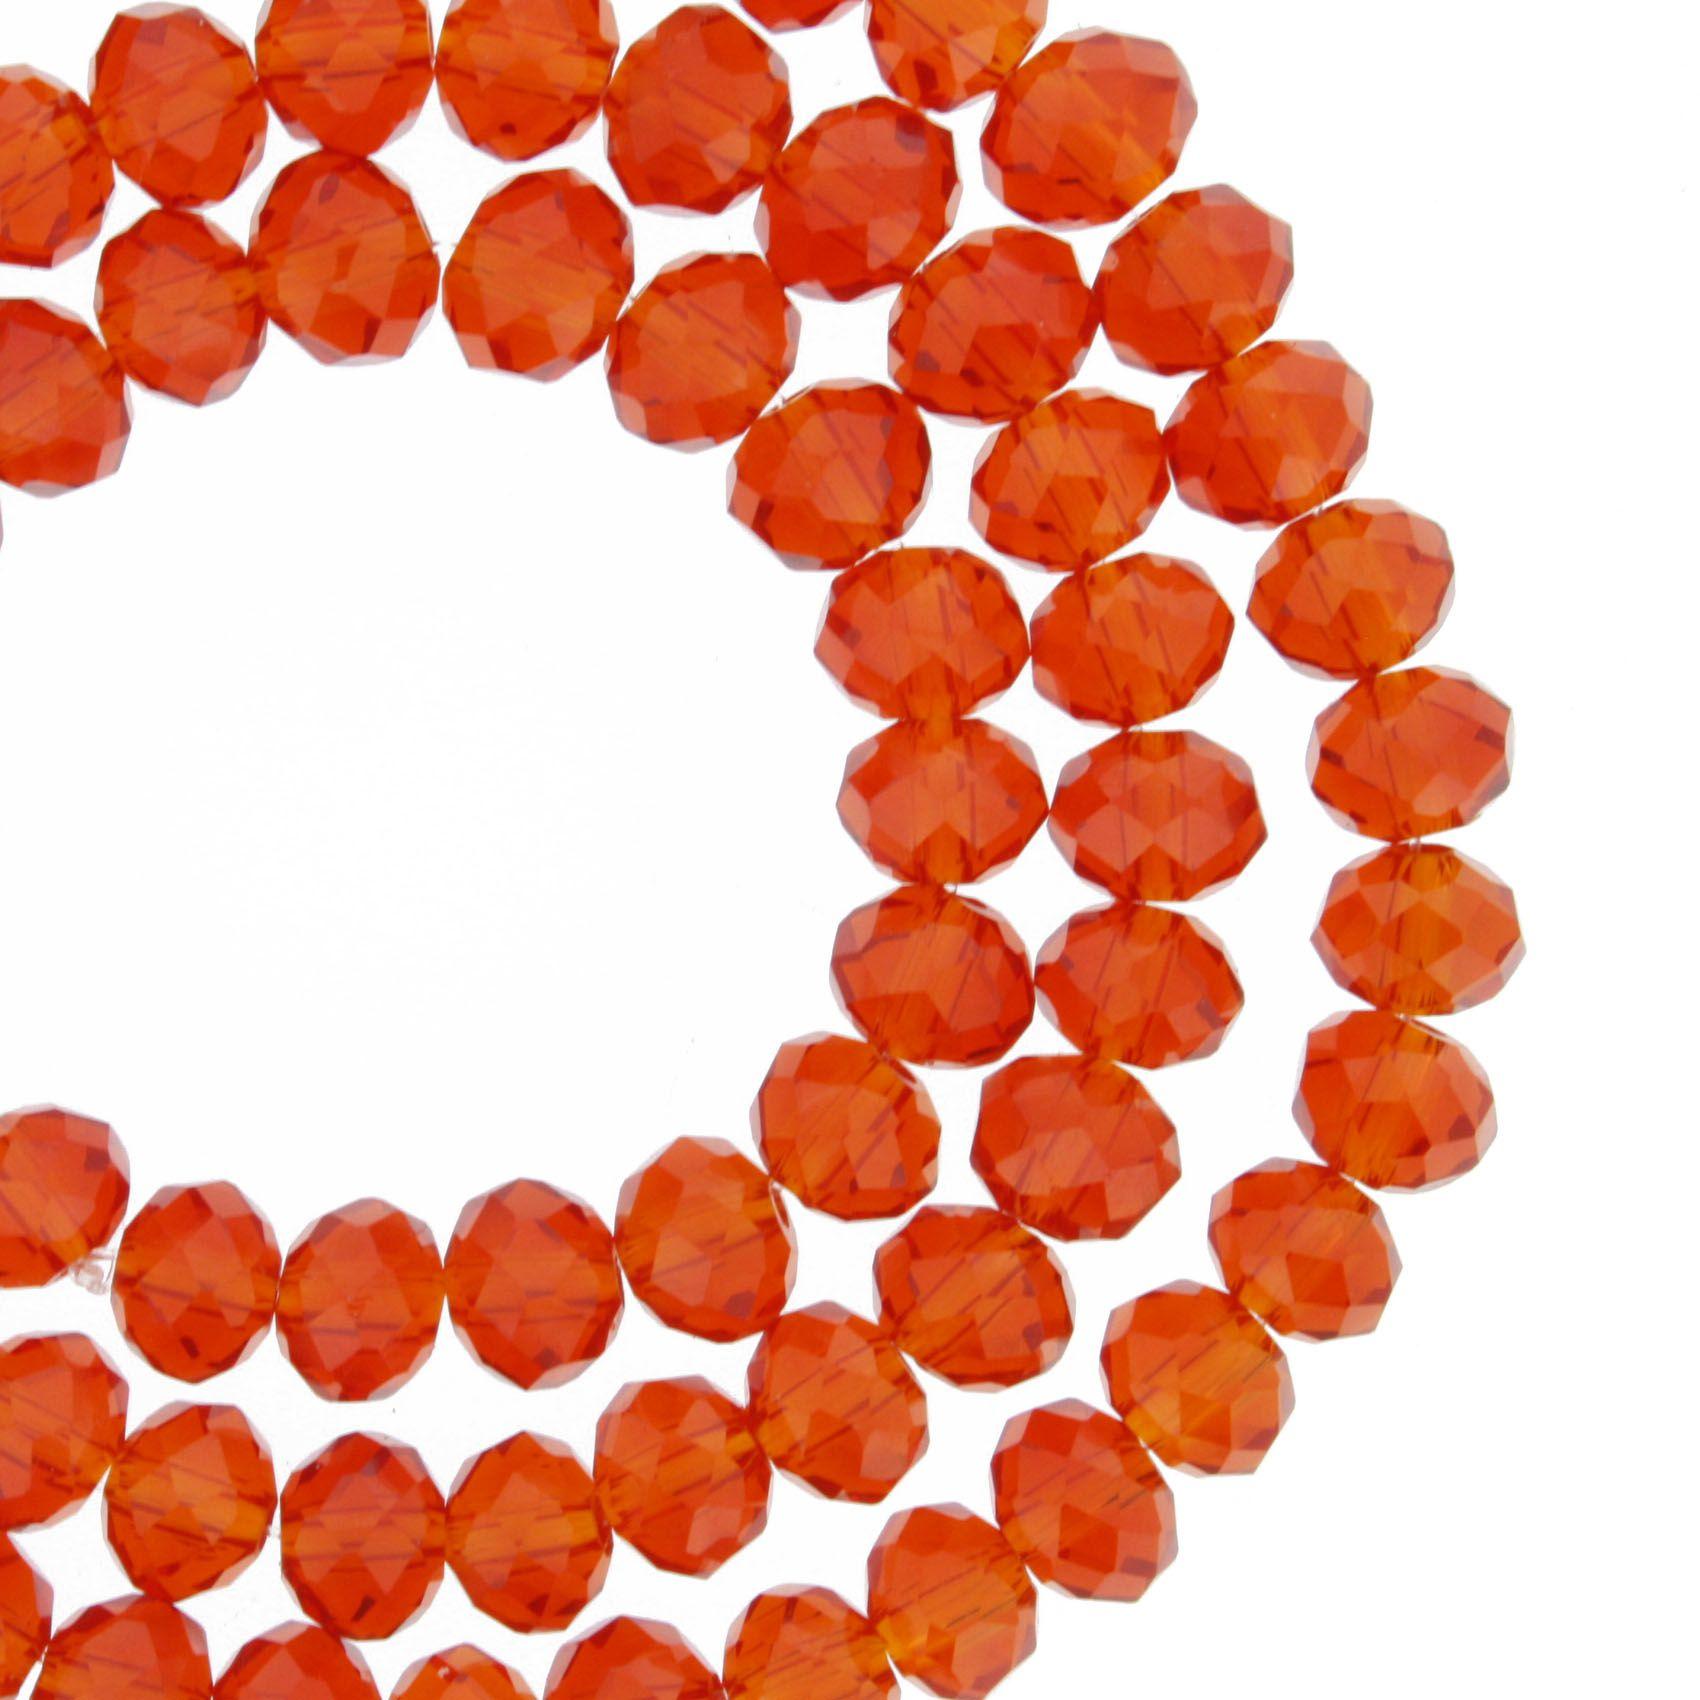 Fio de Cristal - Flat® - Laranja Transparente - 6mm  - Stéphanie Bijoux® - Peças para Bijuterias e Artesanato